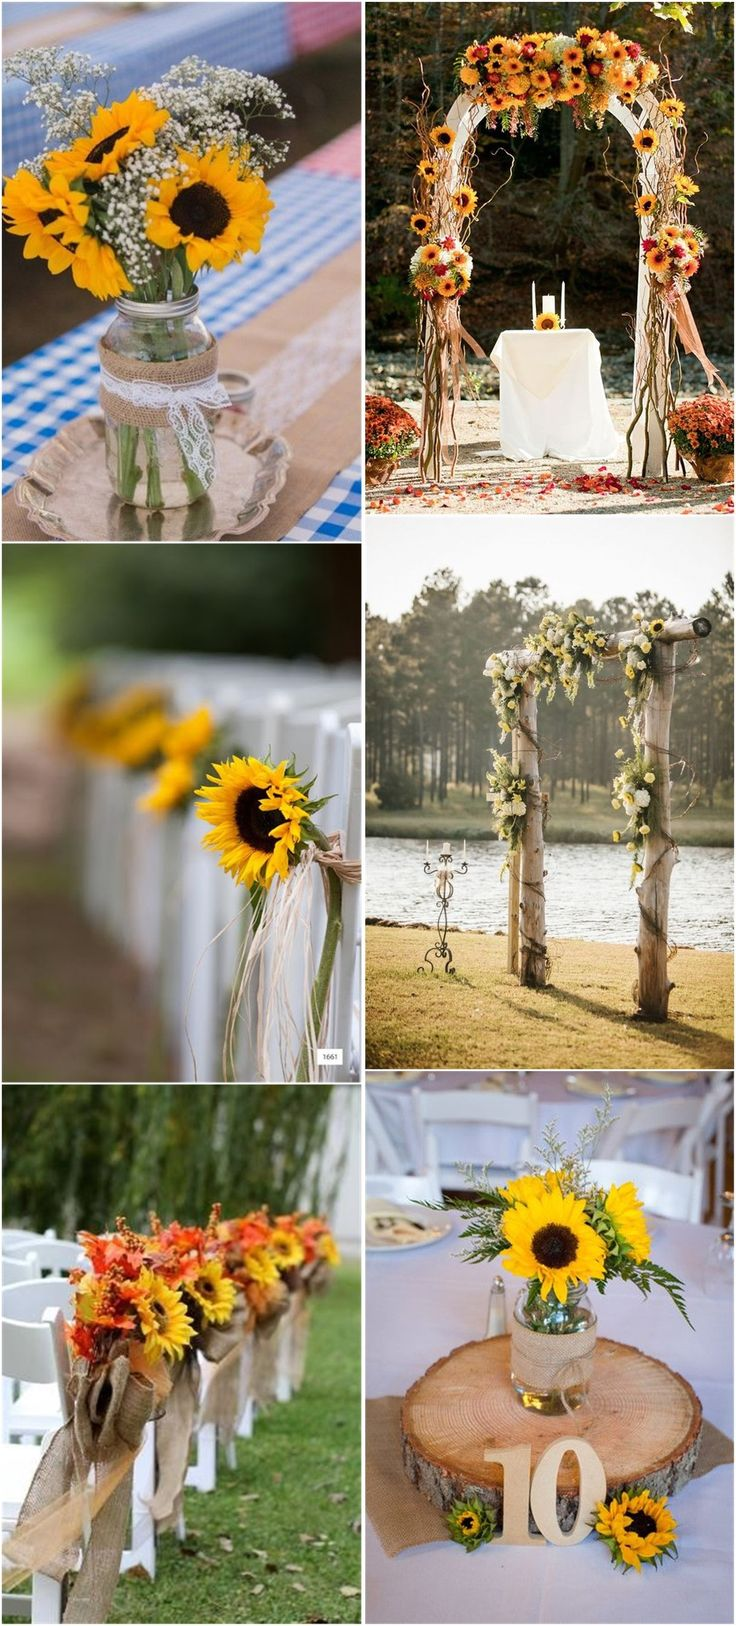 Best 25+ Sunflower wedding decorations ideas on Pinterest ...